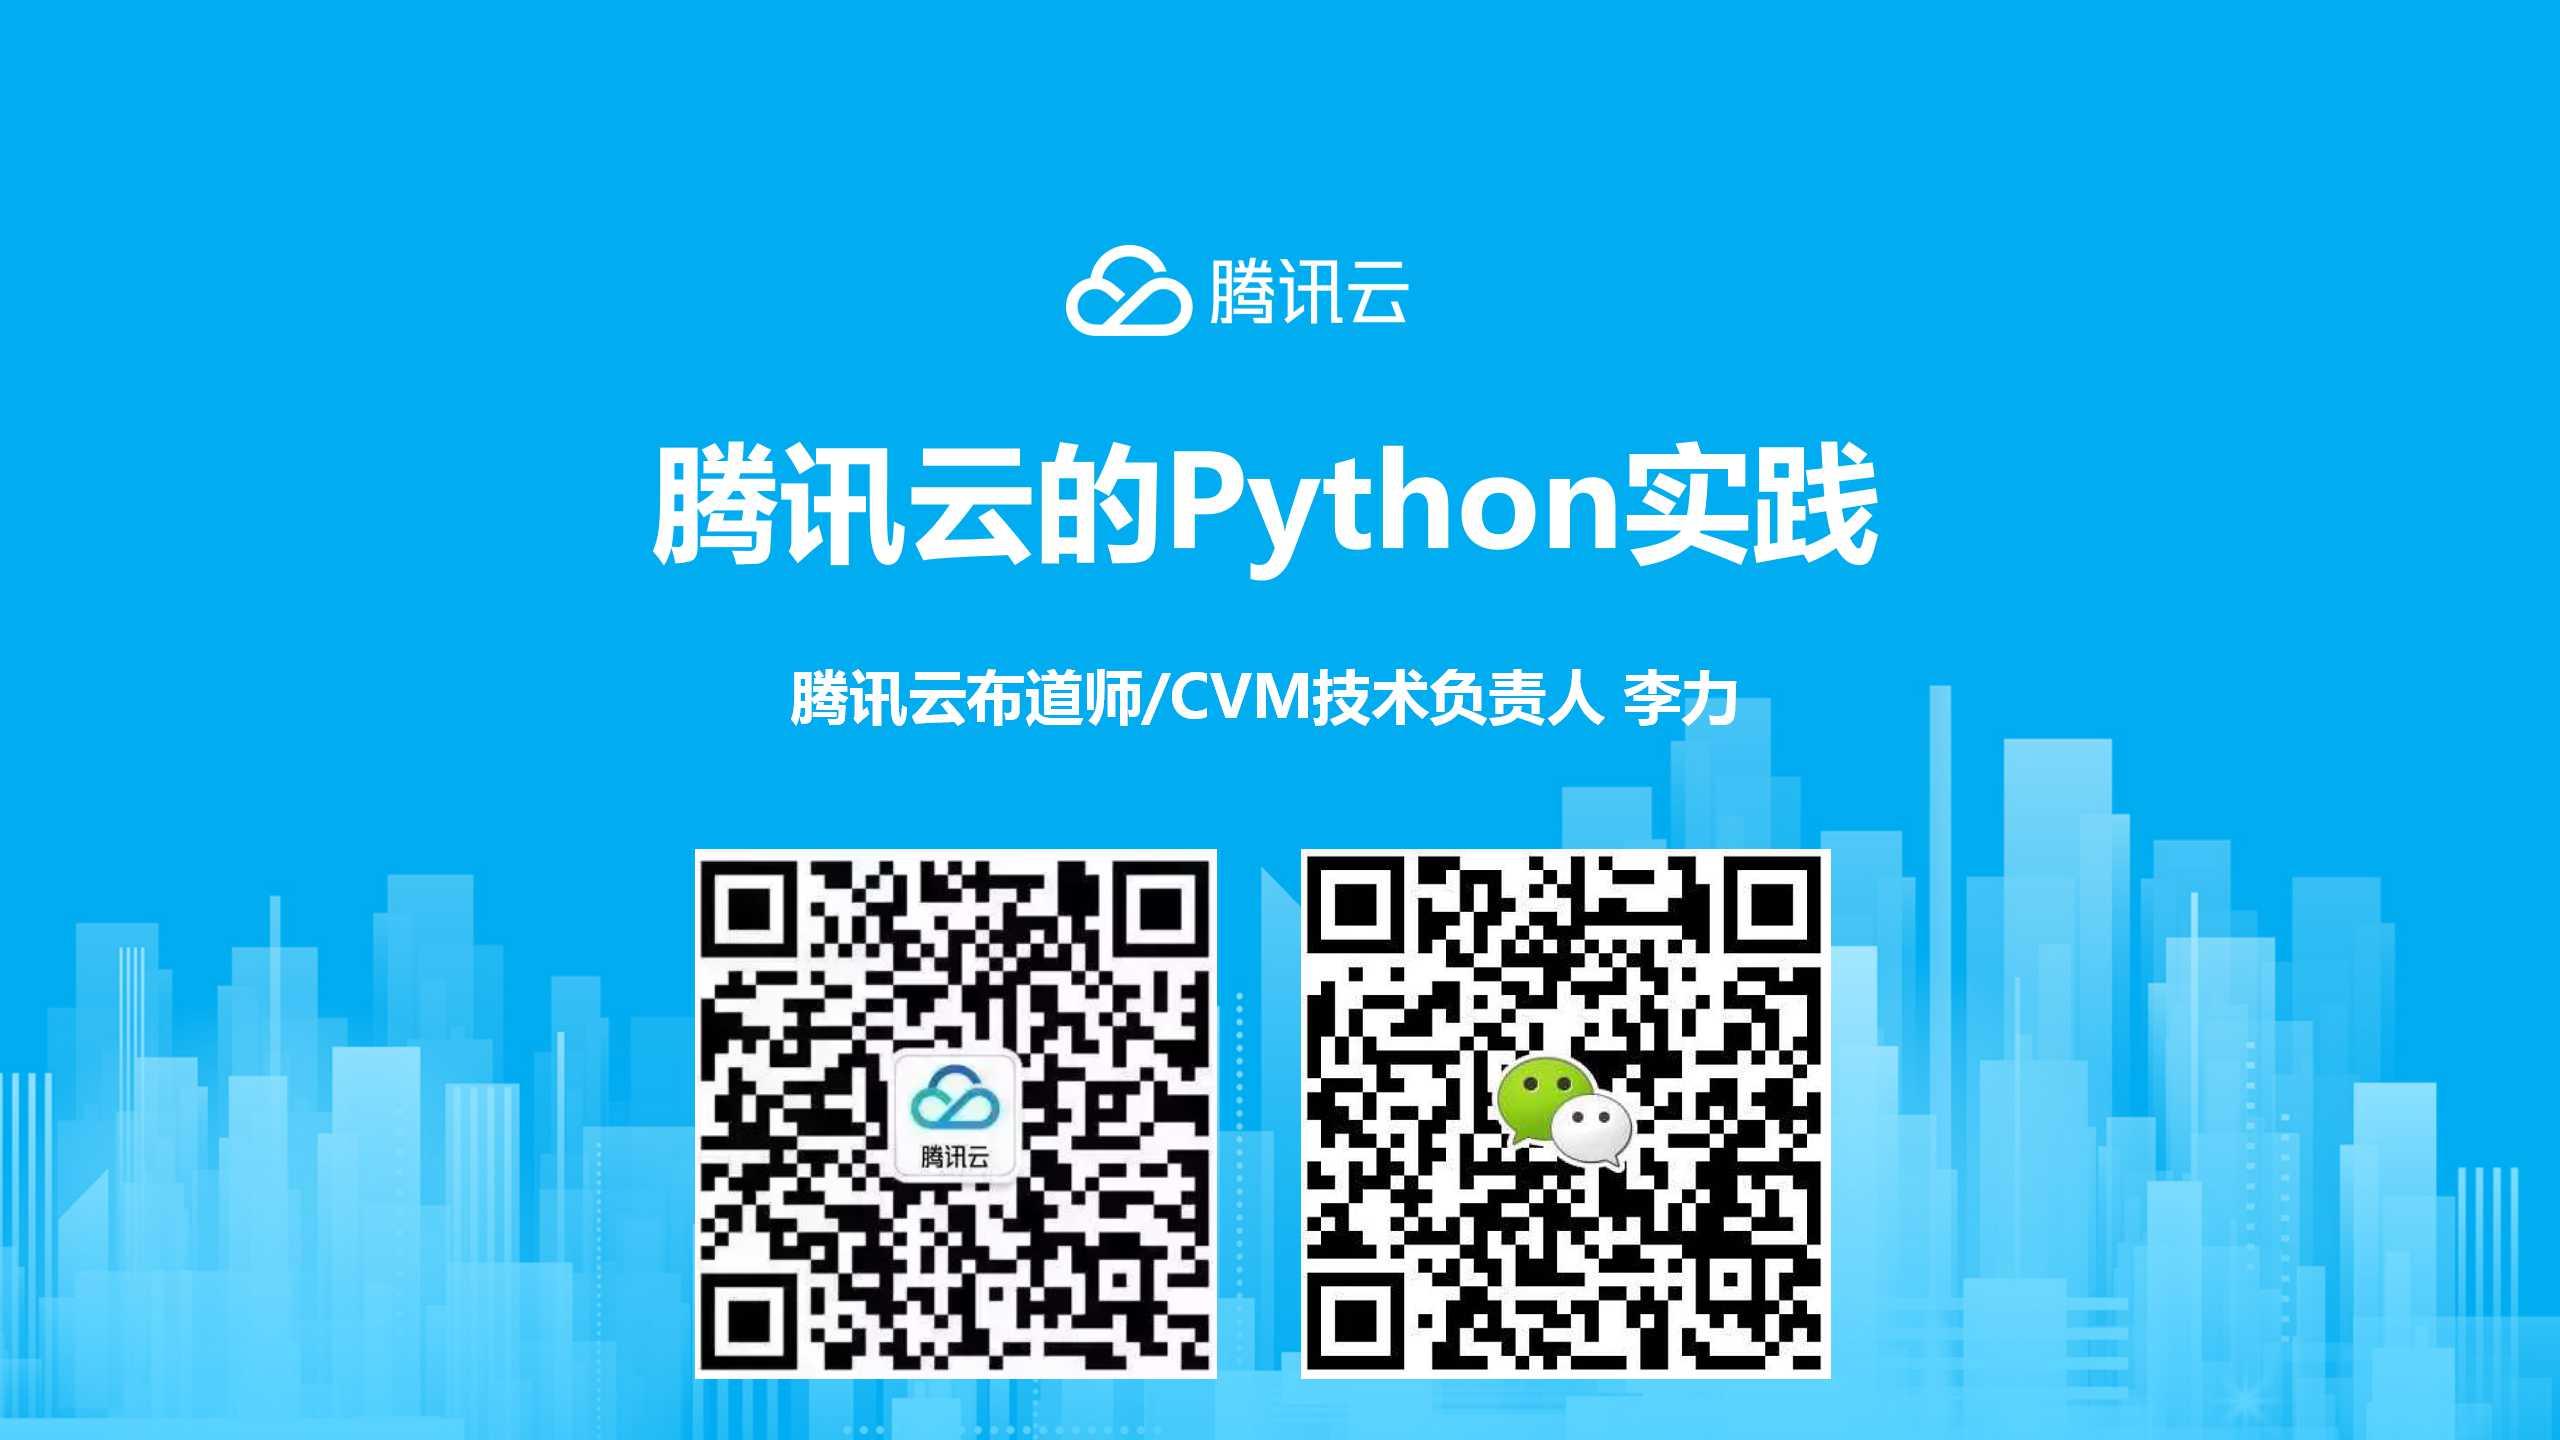 腾讯云的 Python 实践